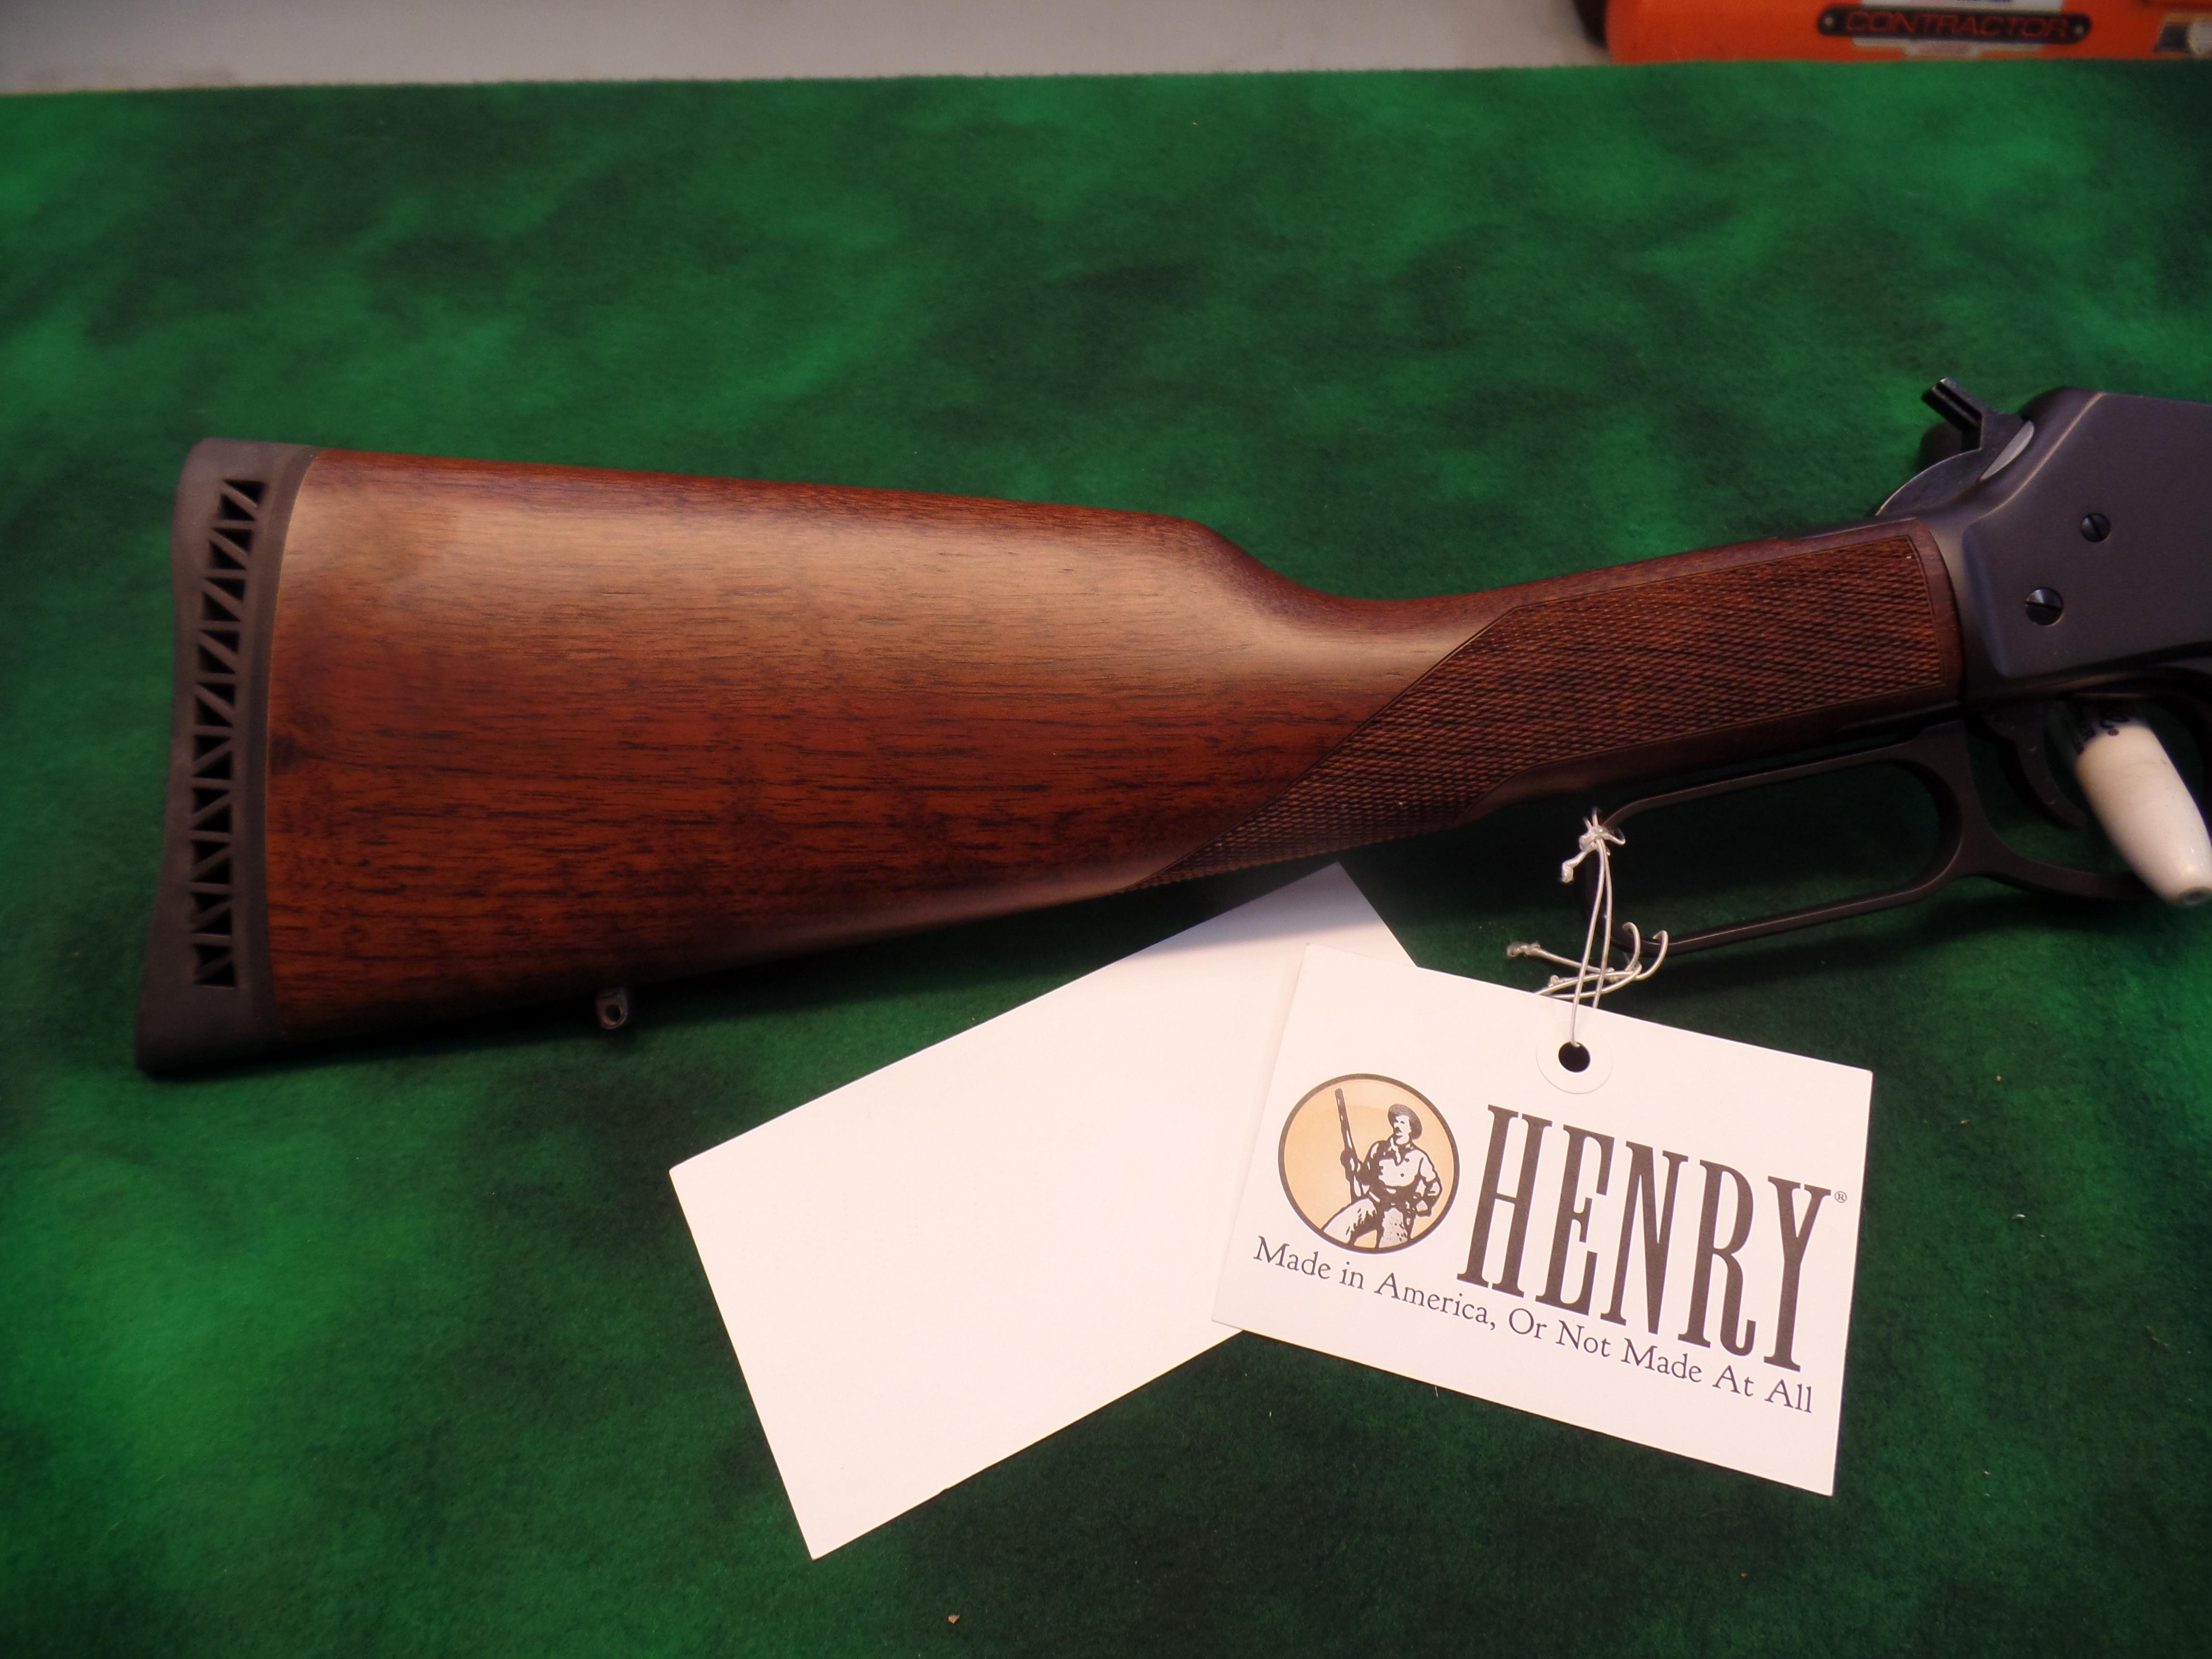 NIB Henry H012M41 .41 Rem Mag-img-2